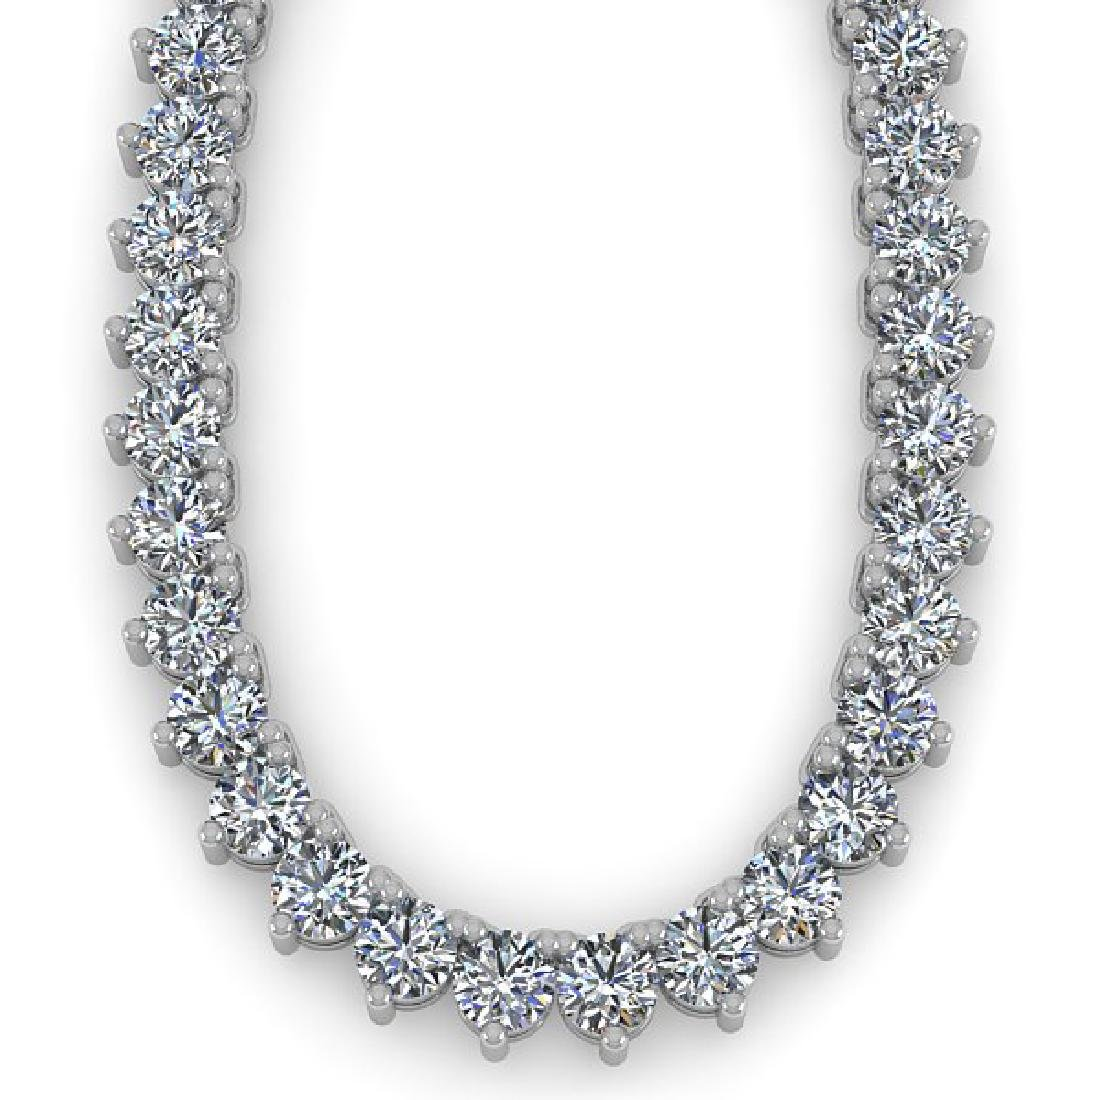 20 CTW Solitaire VS/SI Diamond Necklace 14K White Gold - 2